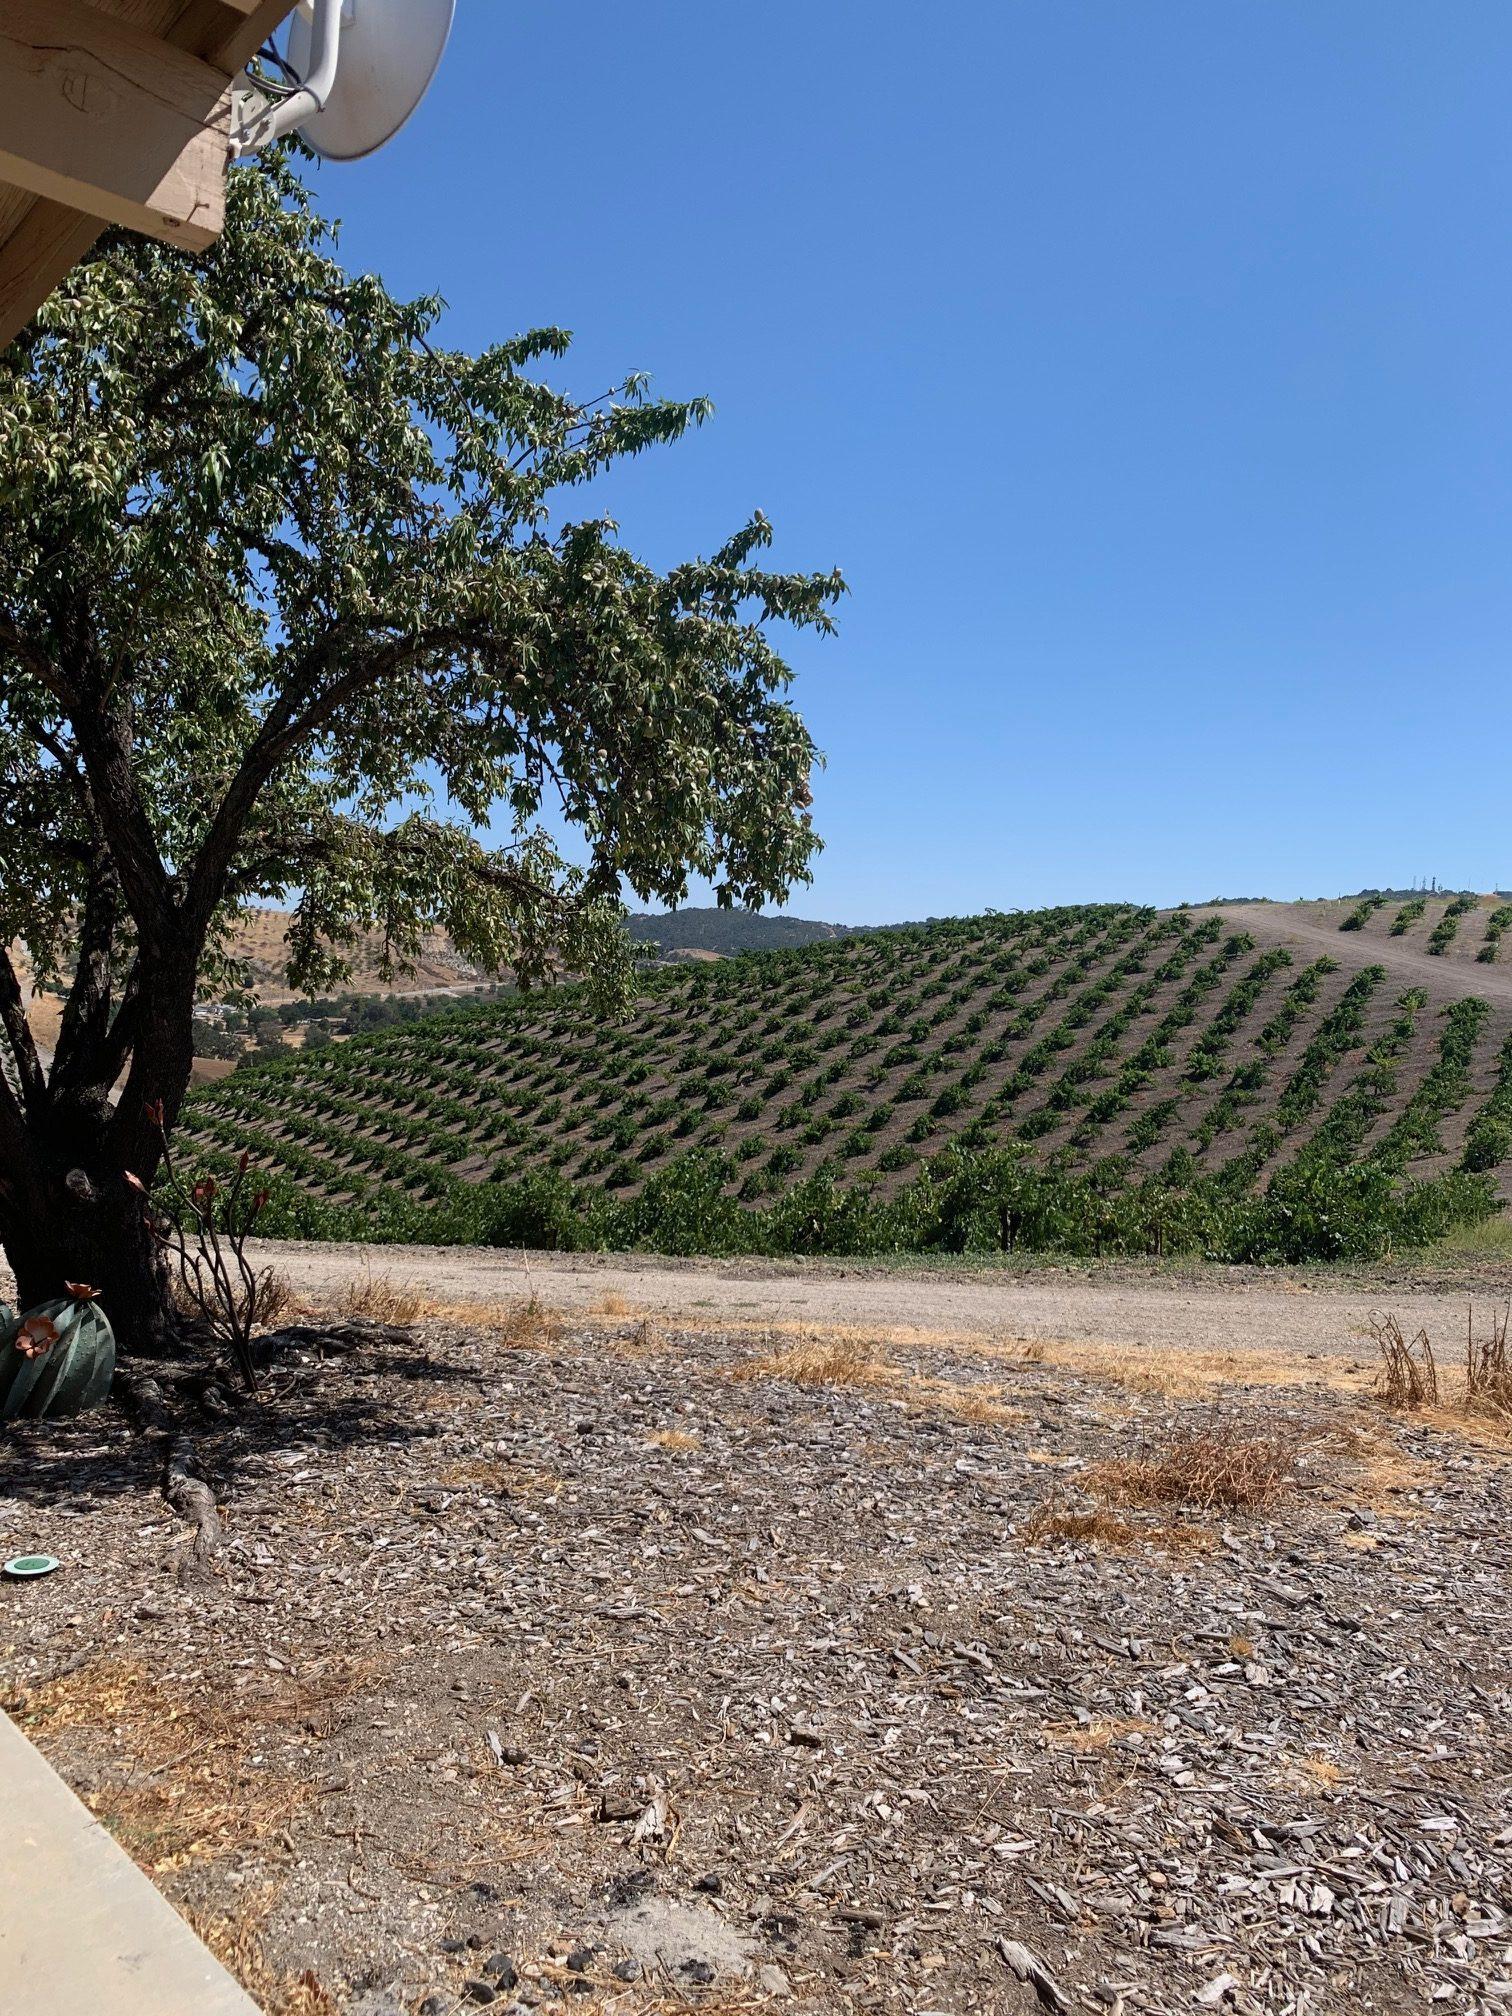 Peachy Canyon Vineyard views